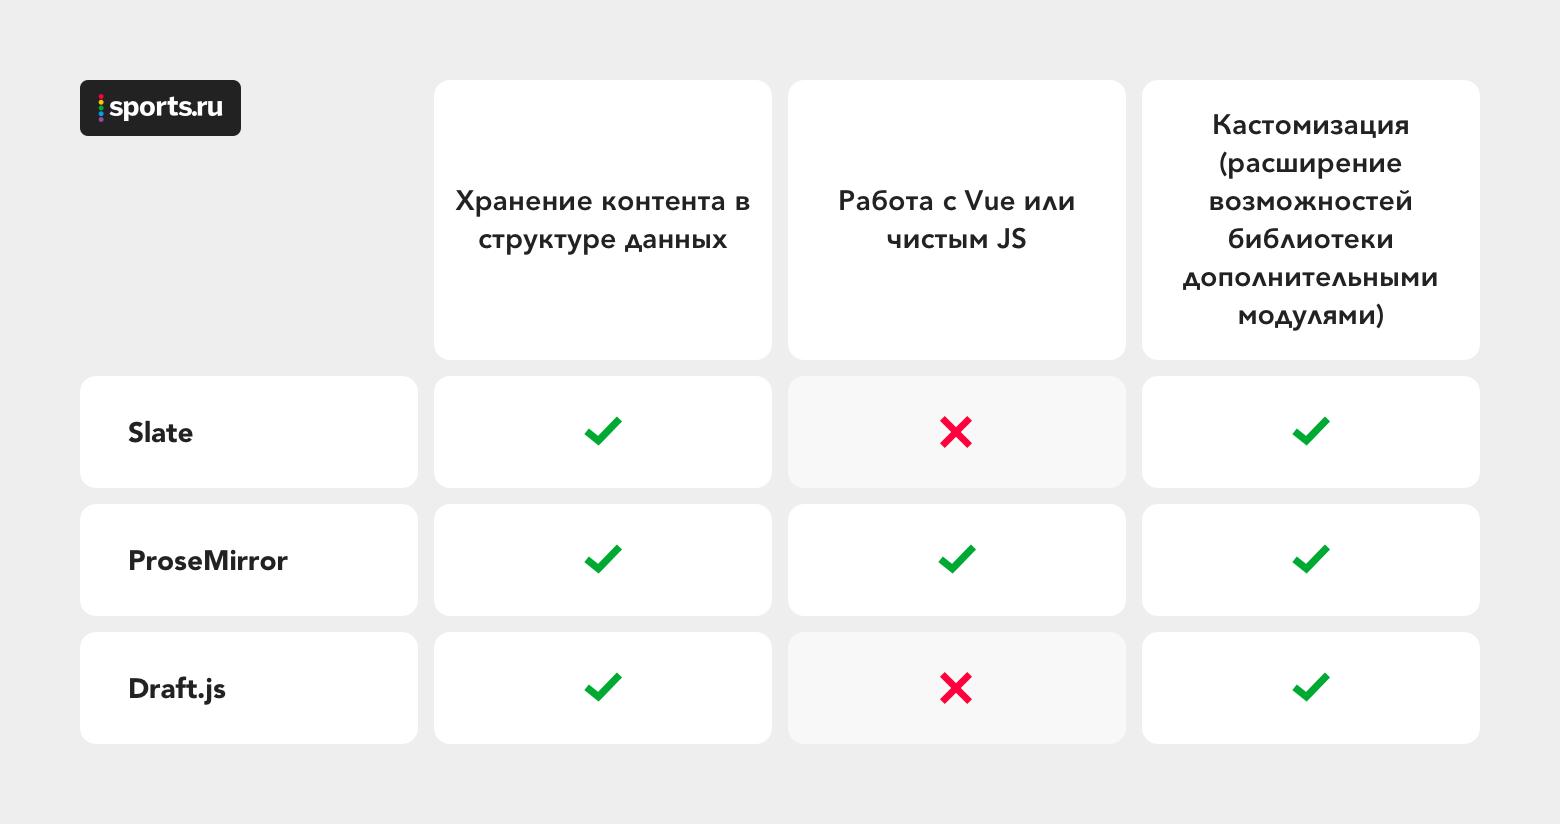 Как в Sports.ru писали свой WYSIWYG-редактор - 3